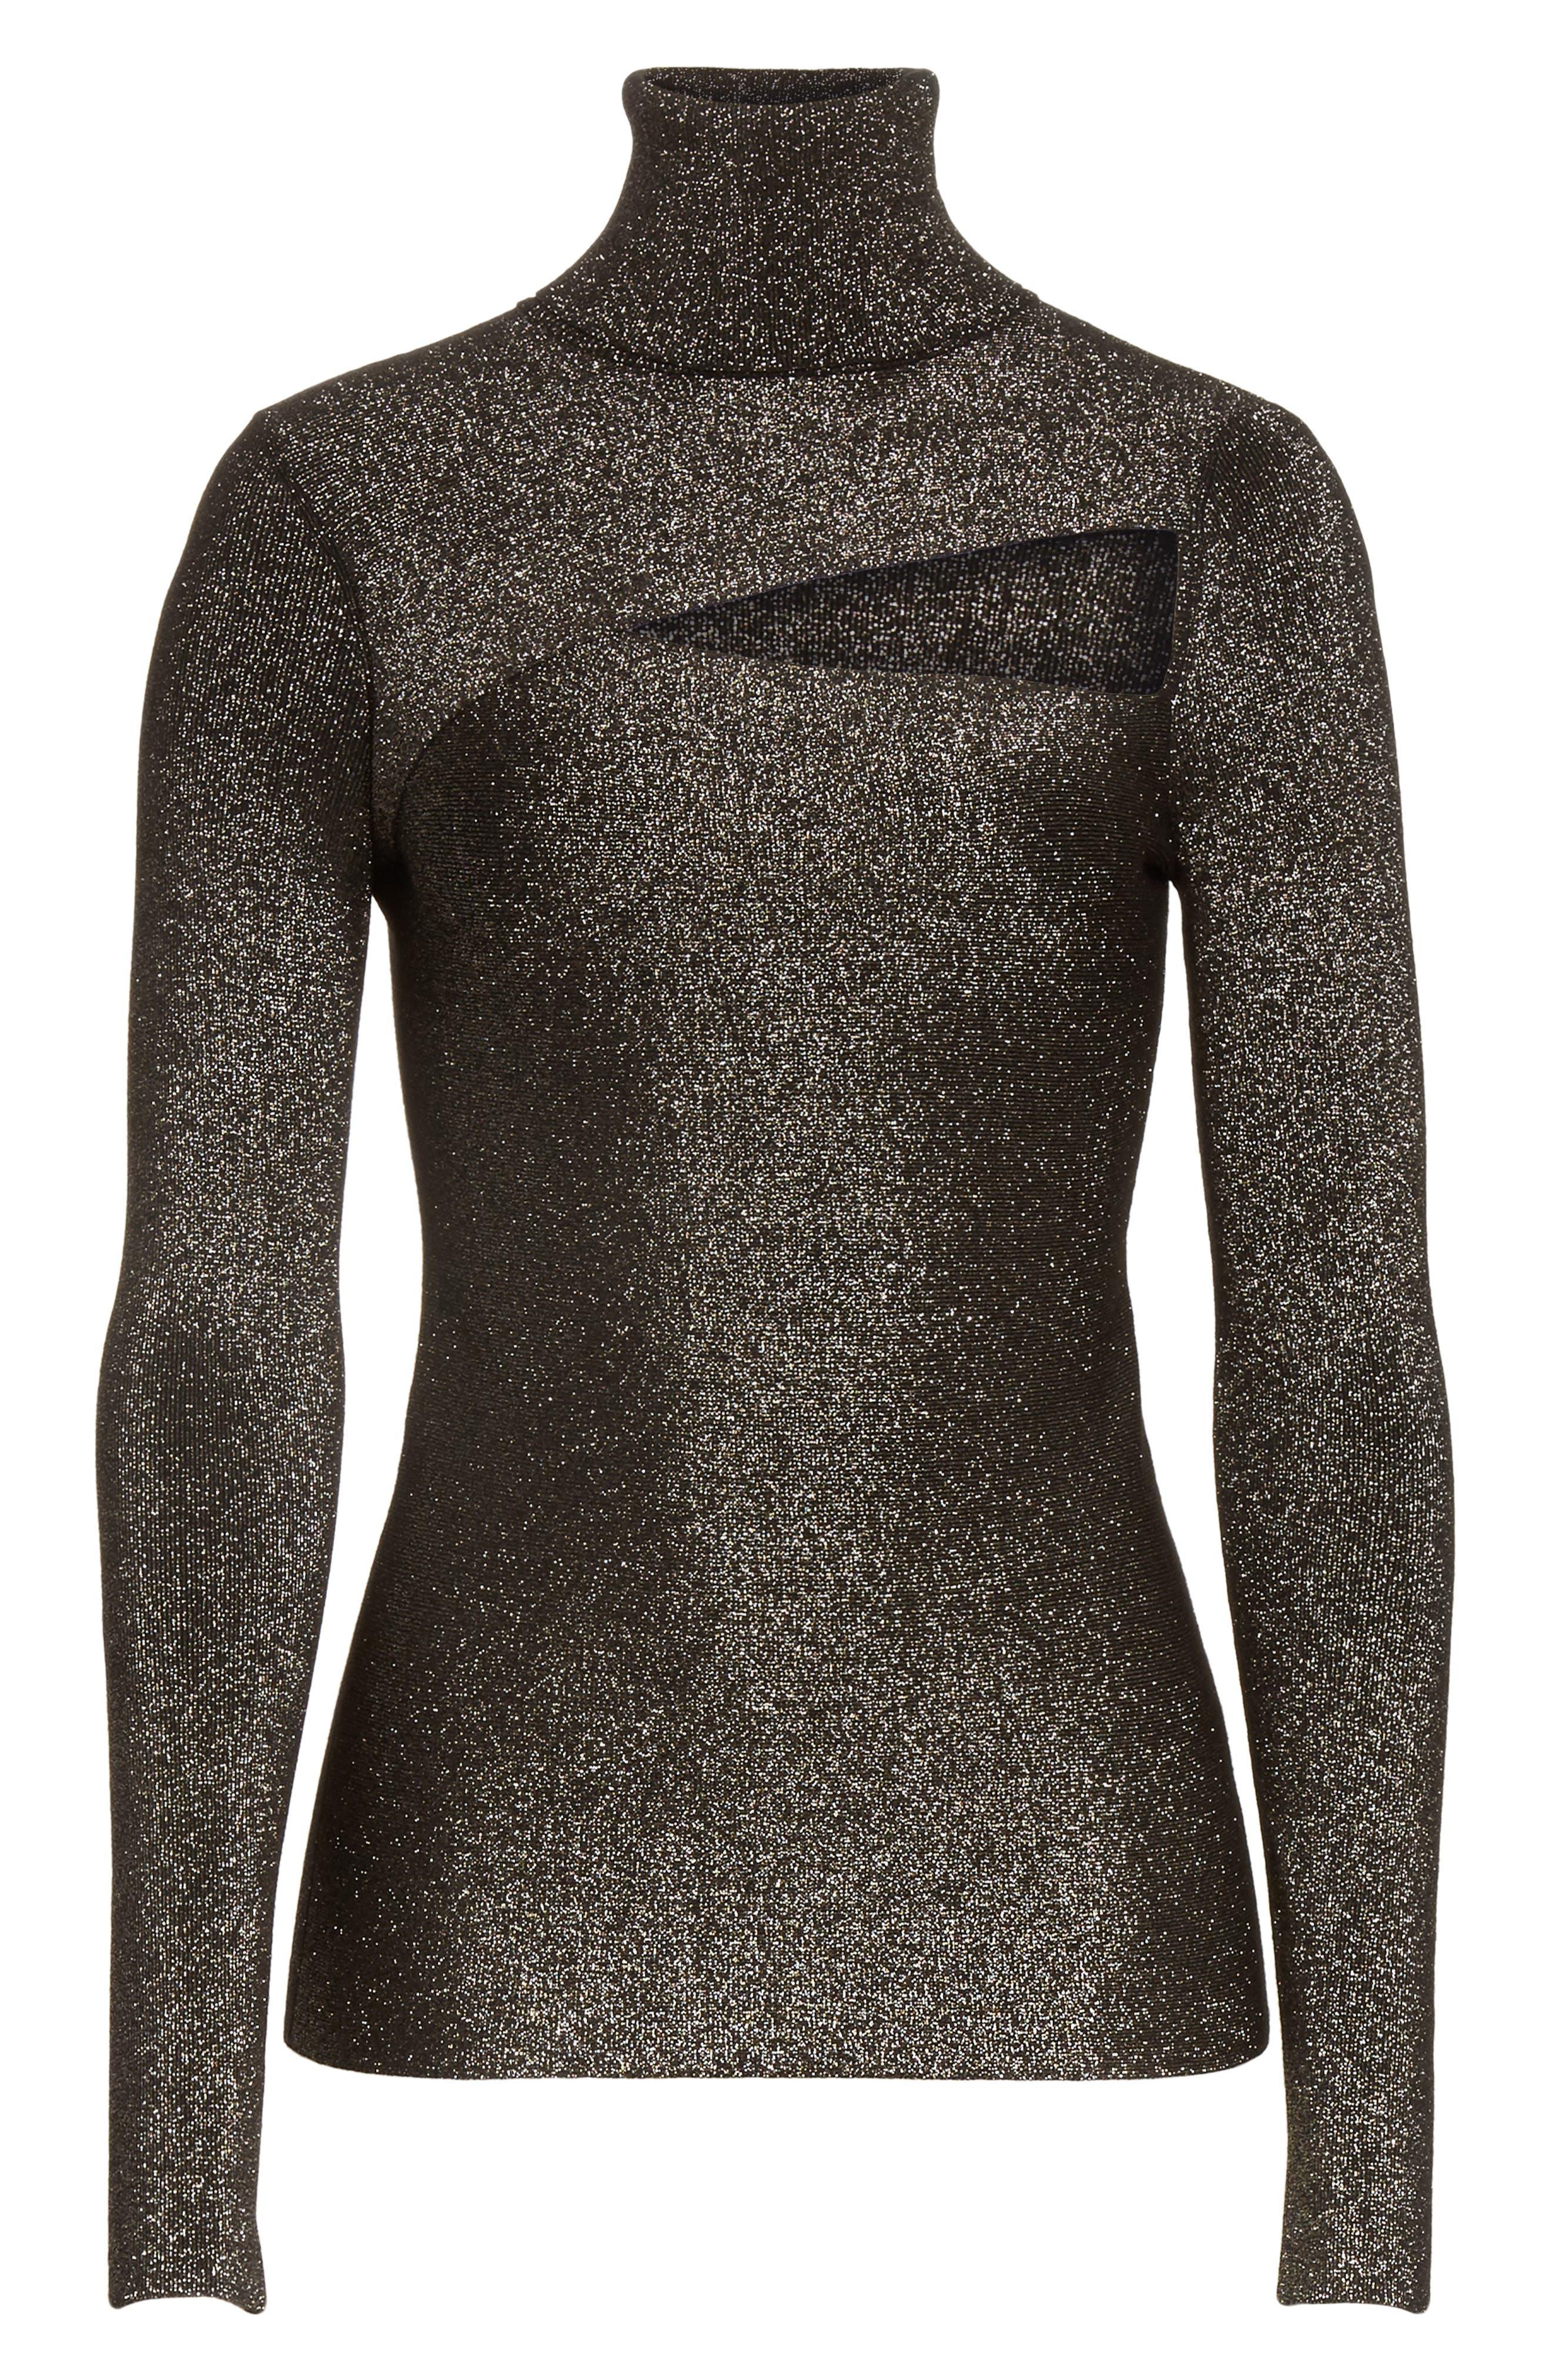 Camden Cutout Sweater,                             Alternate thumbnail 6, color,                             010